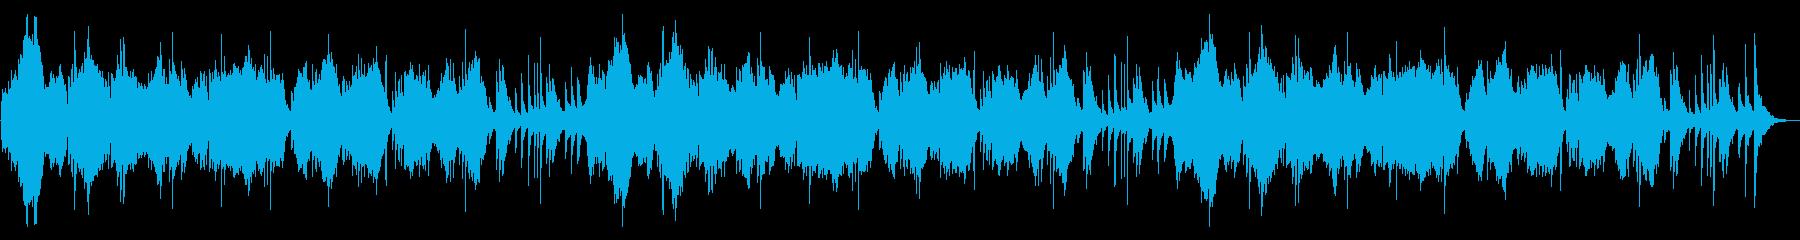 Japanese New Year /Shakuhachi and Koto's reproduced waveform